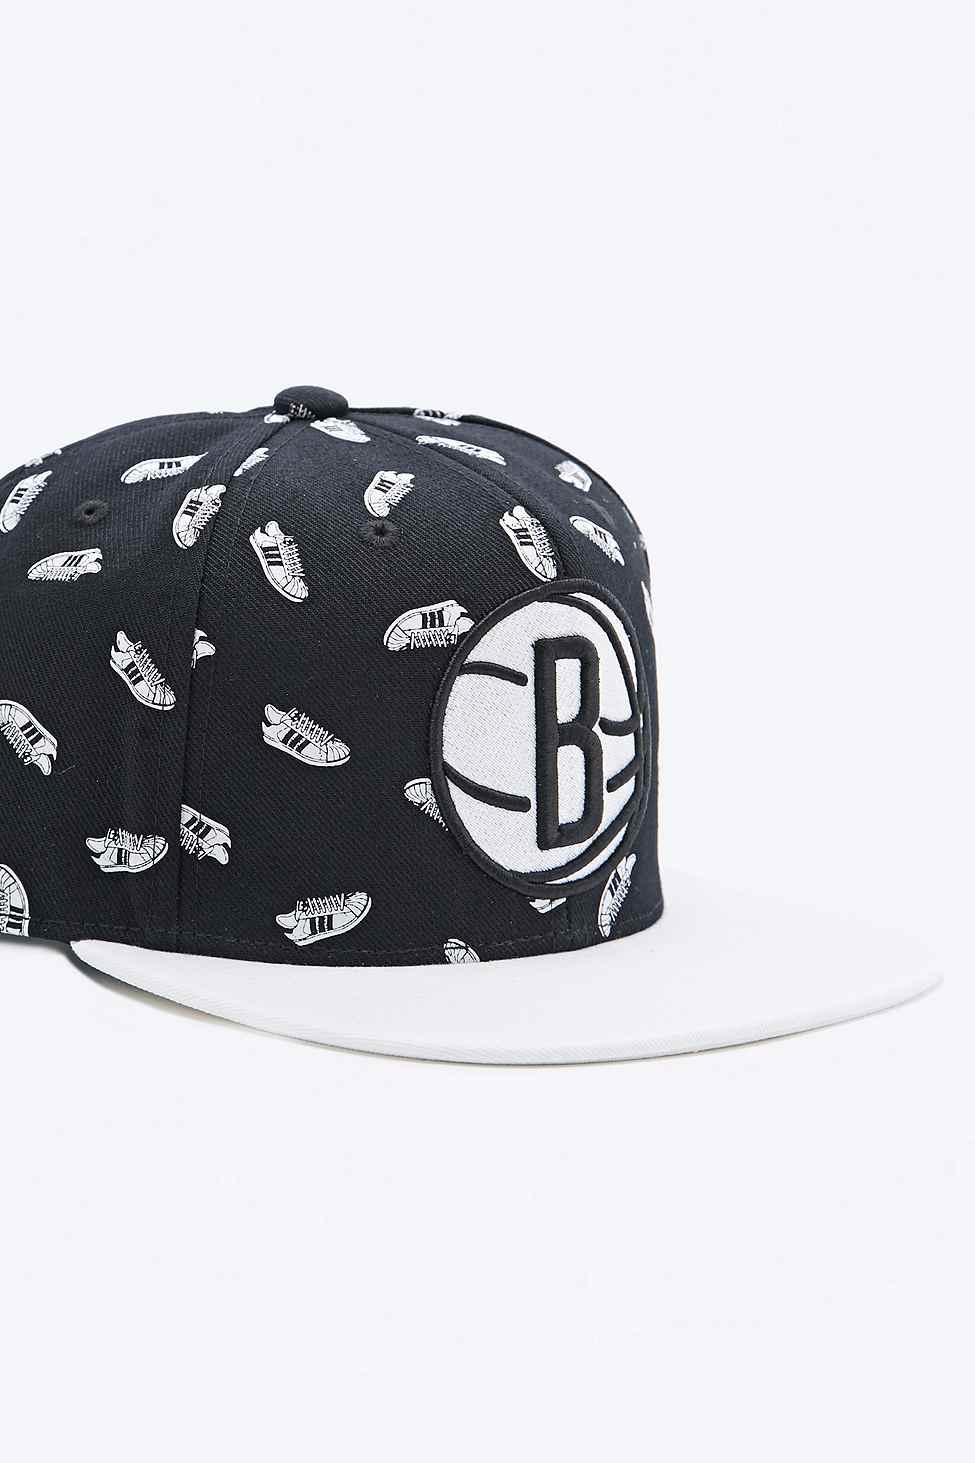 a1591da77010b adidas Superstar Nba Brooklyn Nets Snapback Cap in Black for Men - Lyst